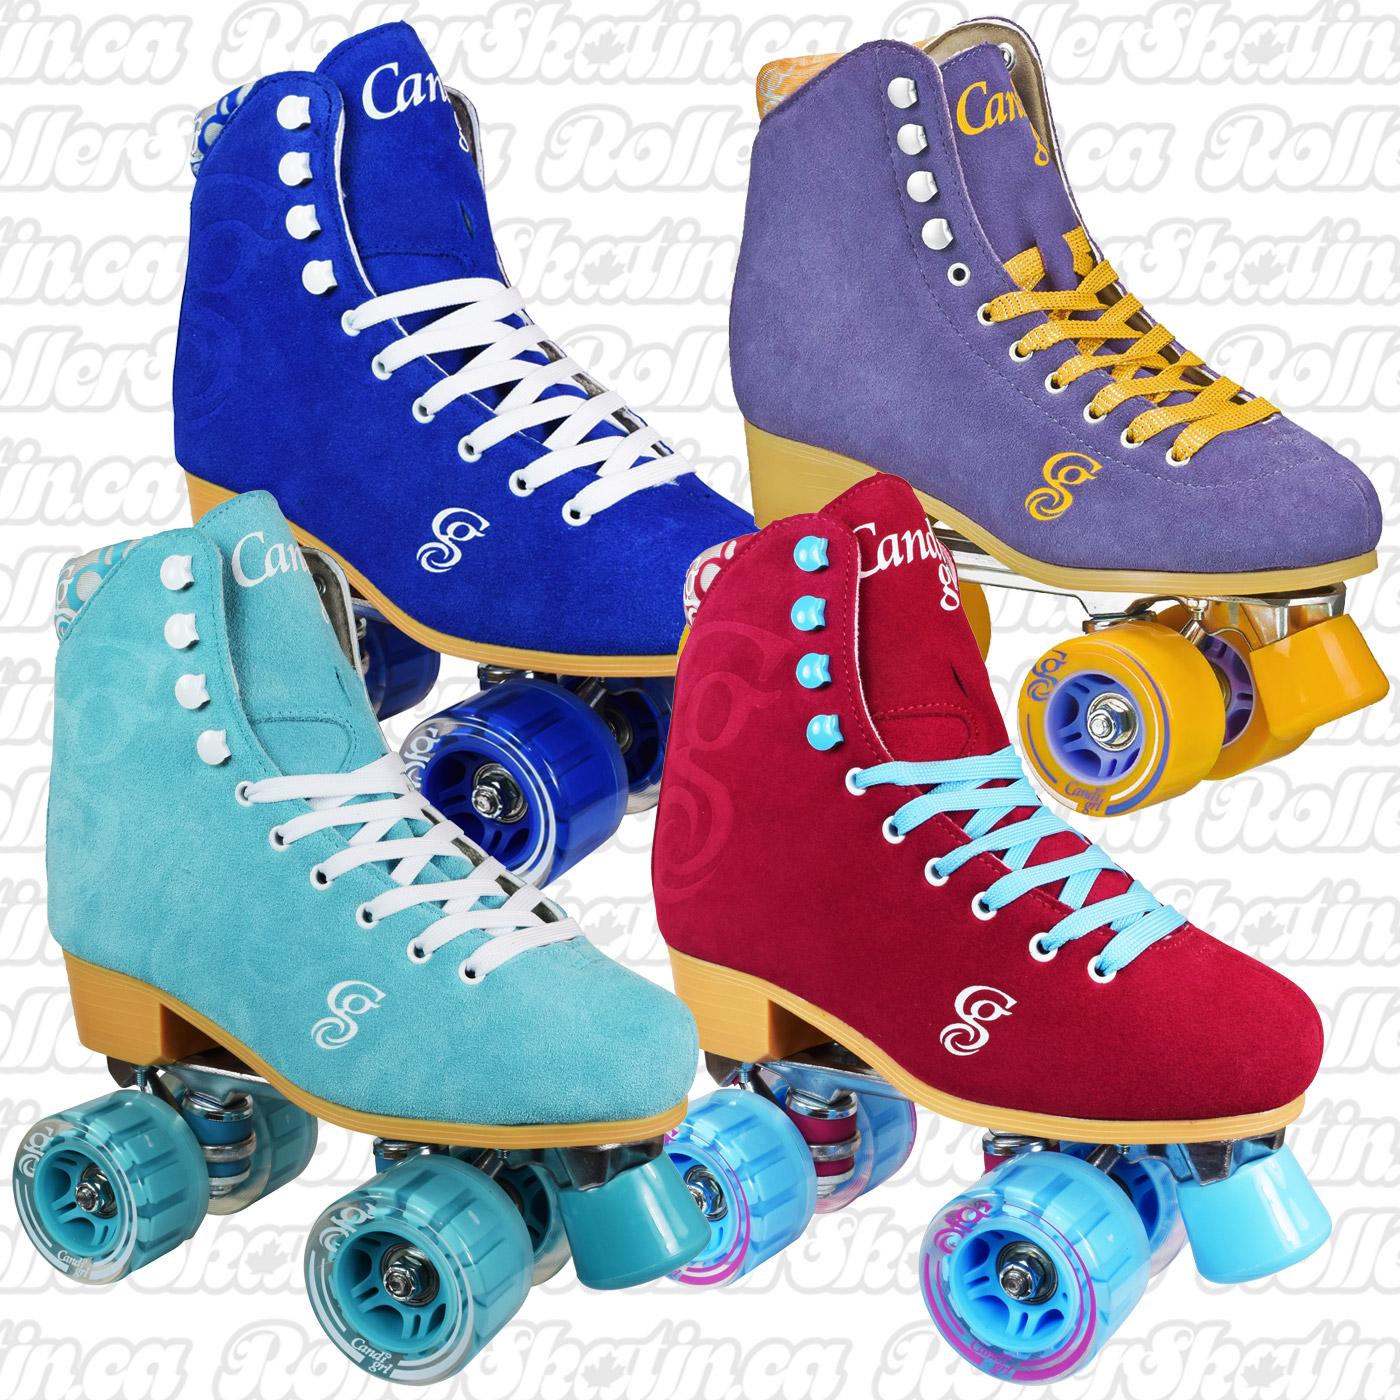 INSTOCK! Candi Girl Carlin Suede Roller Skates!